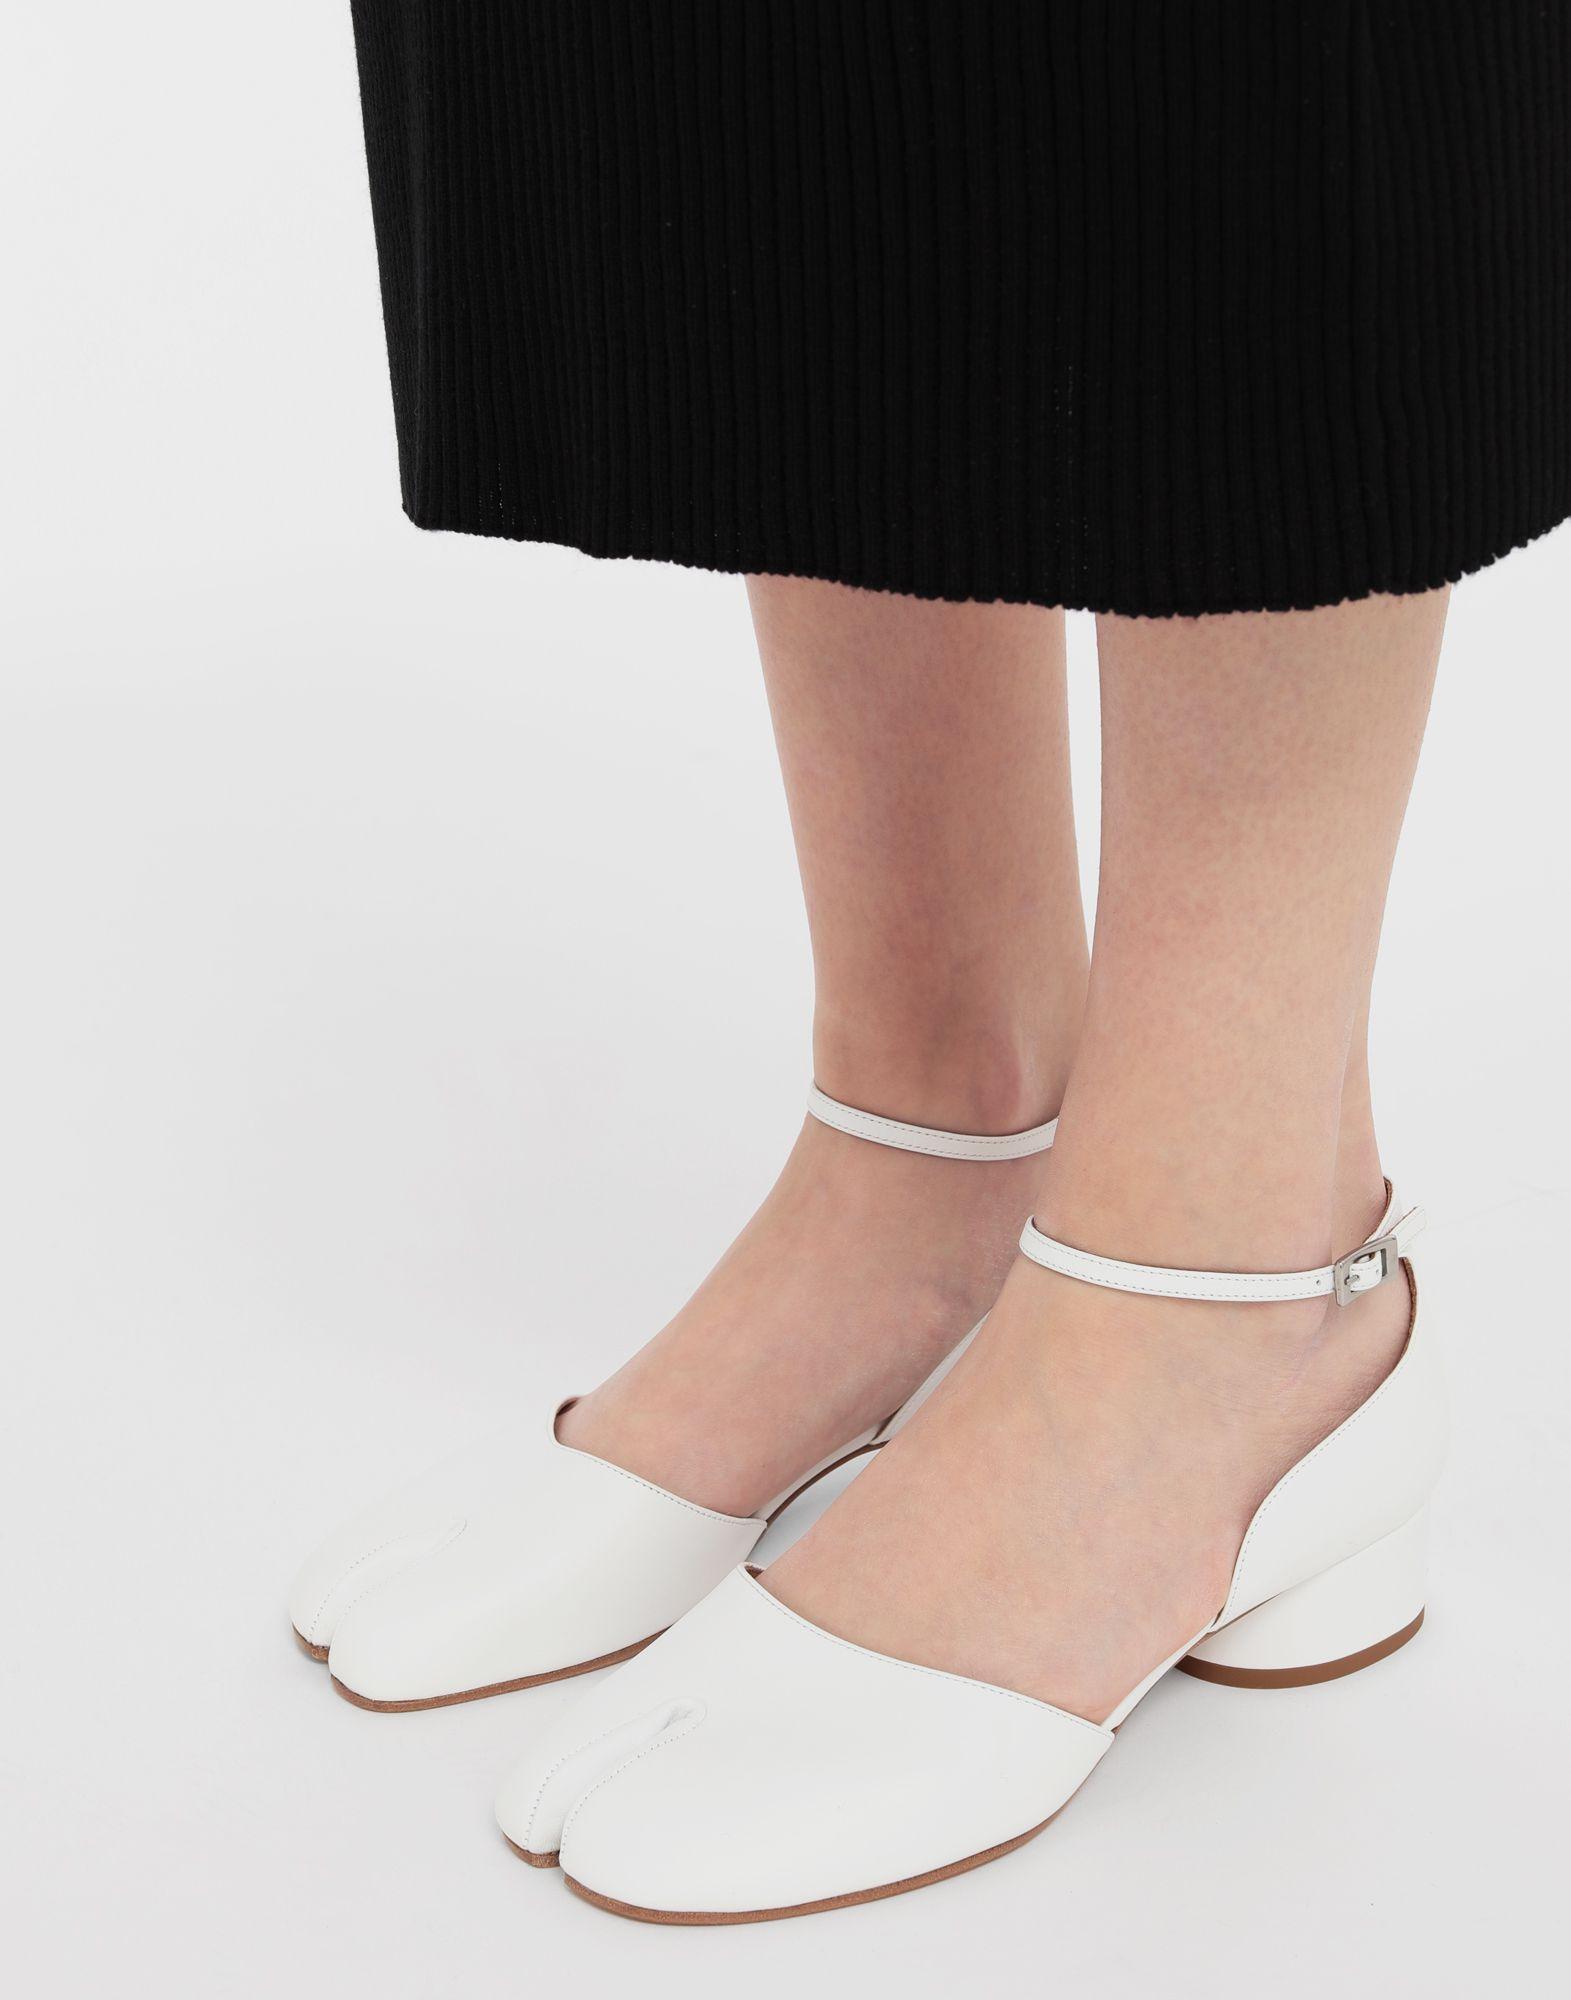 ba6731670ca7 Maison Margiela - White Tabi Leather Ankle Strap Shoes - Lyst. View  fullscreen